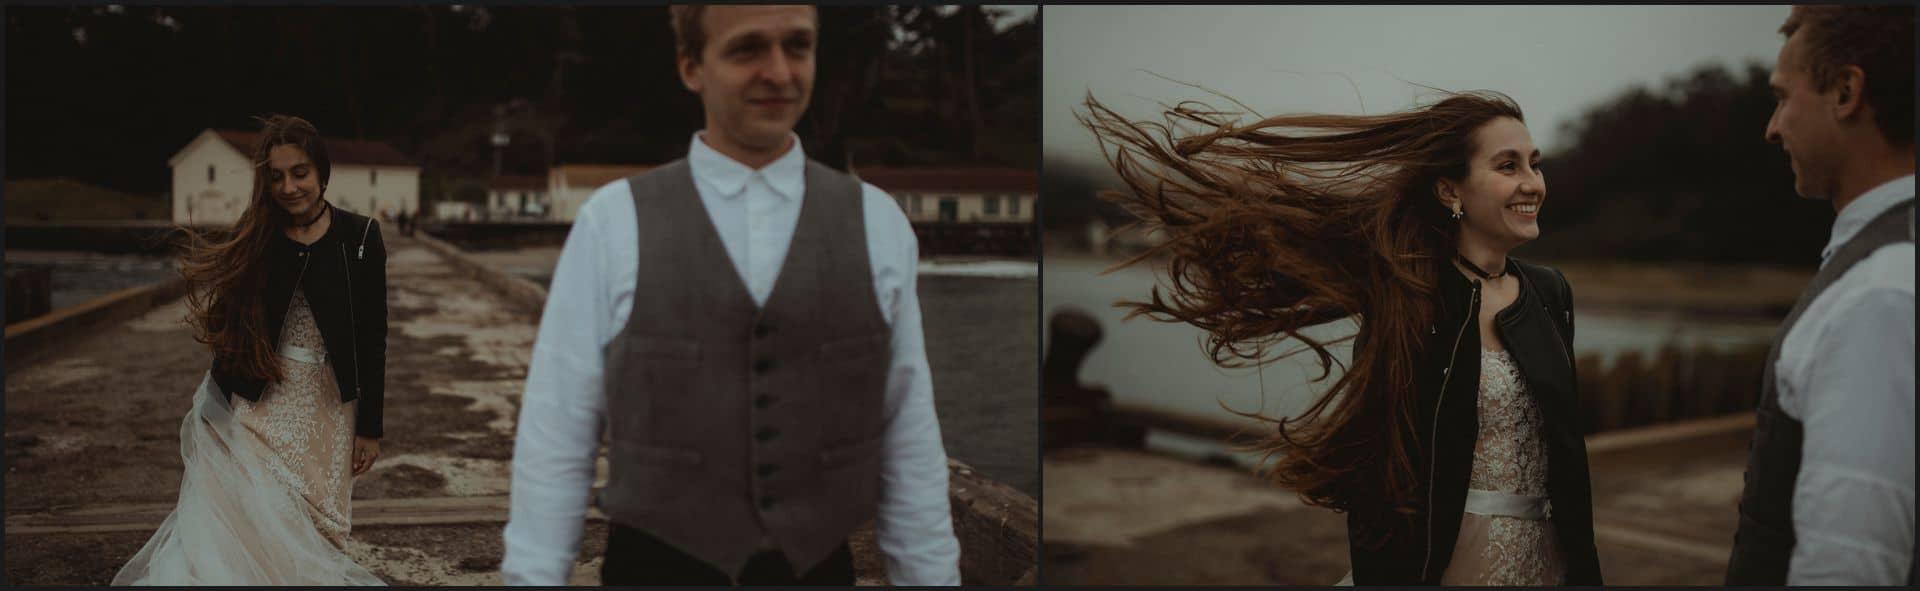 san francisco, california, elopement wedding, bride, groom, first look